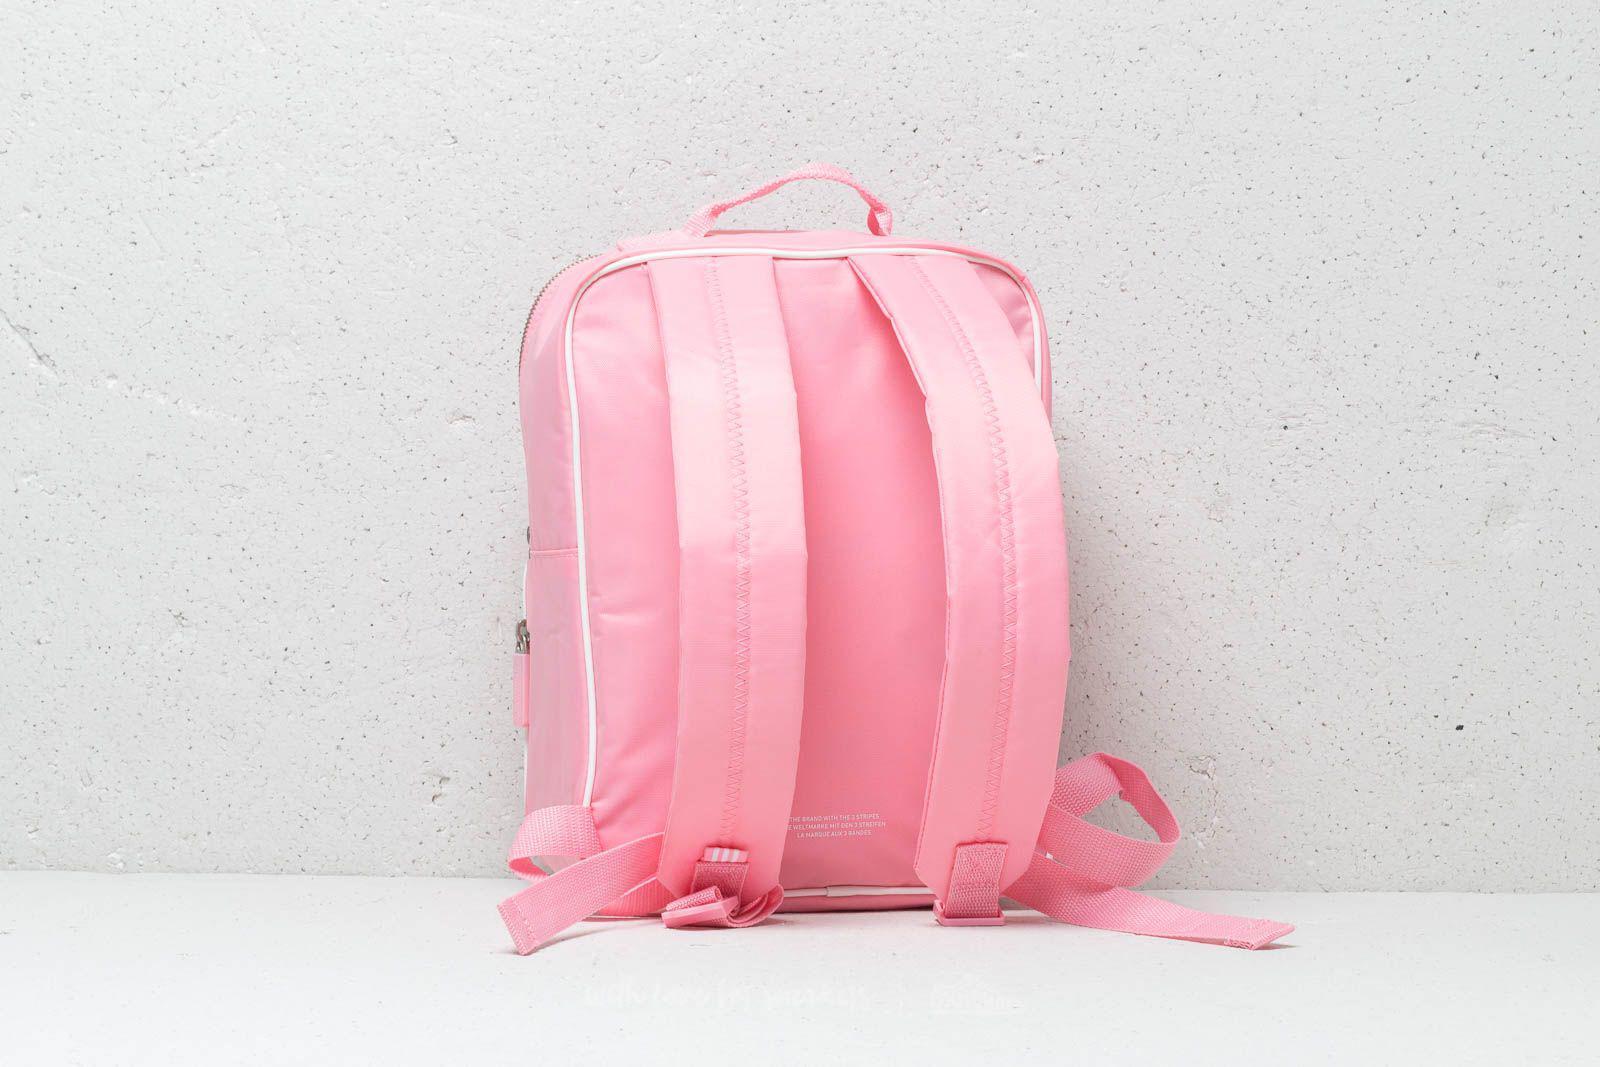 Lyst - adidas Originals Adidas Classic Adicolor Medium Backpack ... 5db6165f0069b